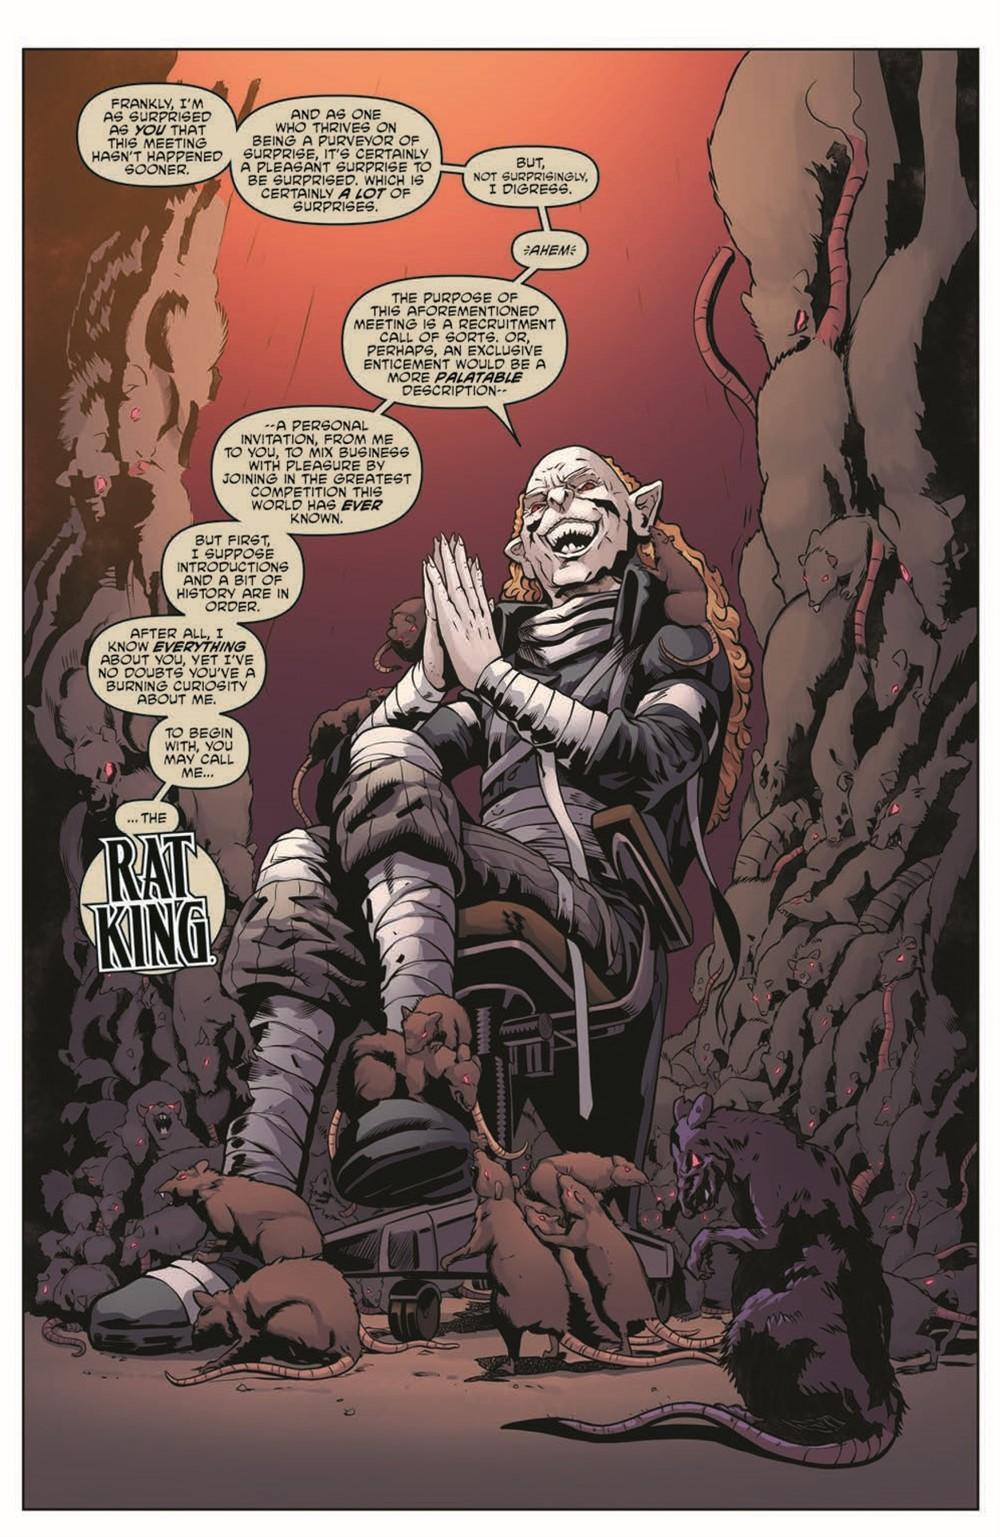 TMNT-Annual2021_pr-3 ComicList Previews: TEENAGE MUTANT NINJA TURTLES ANNUAL 2021